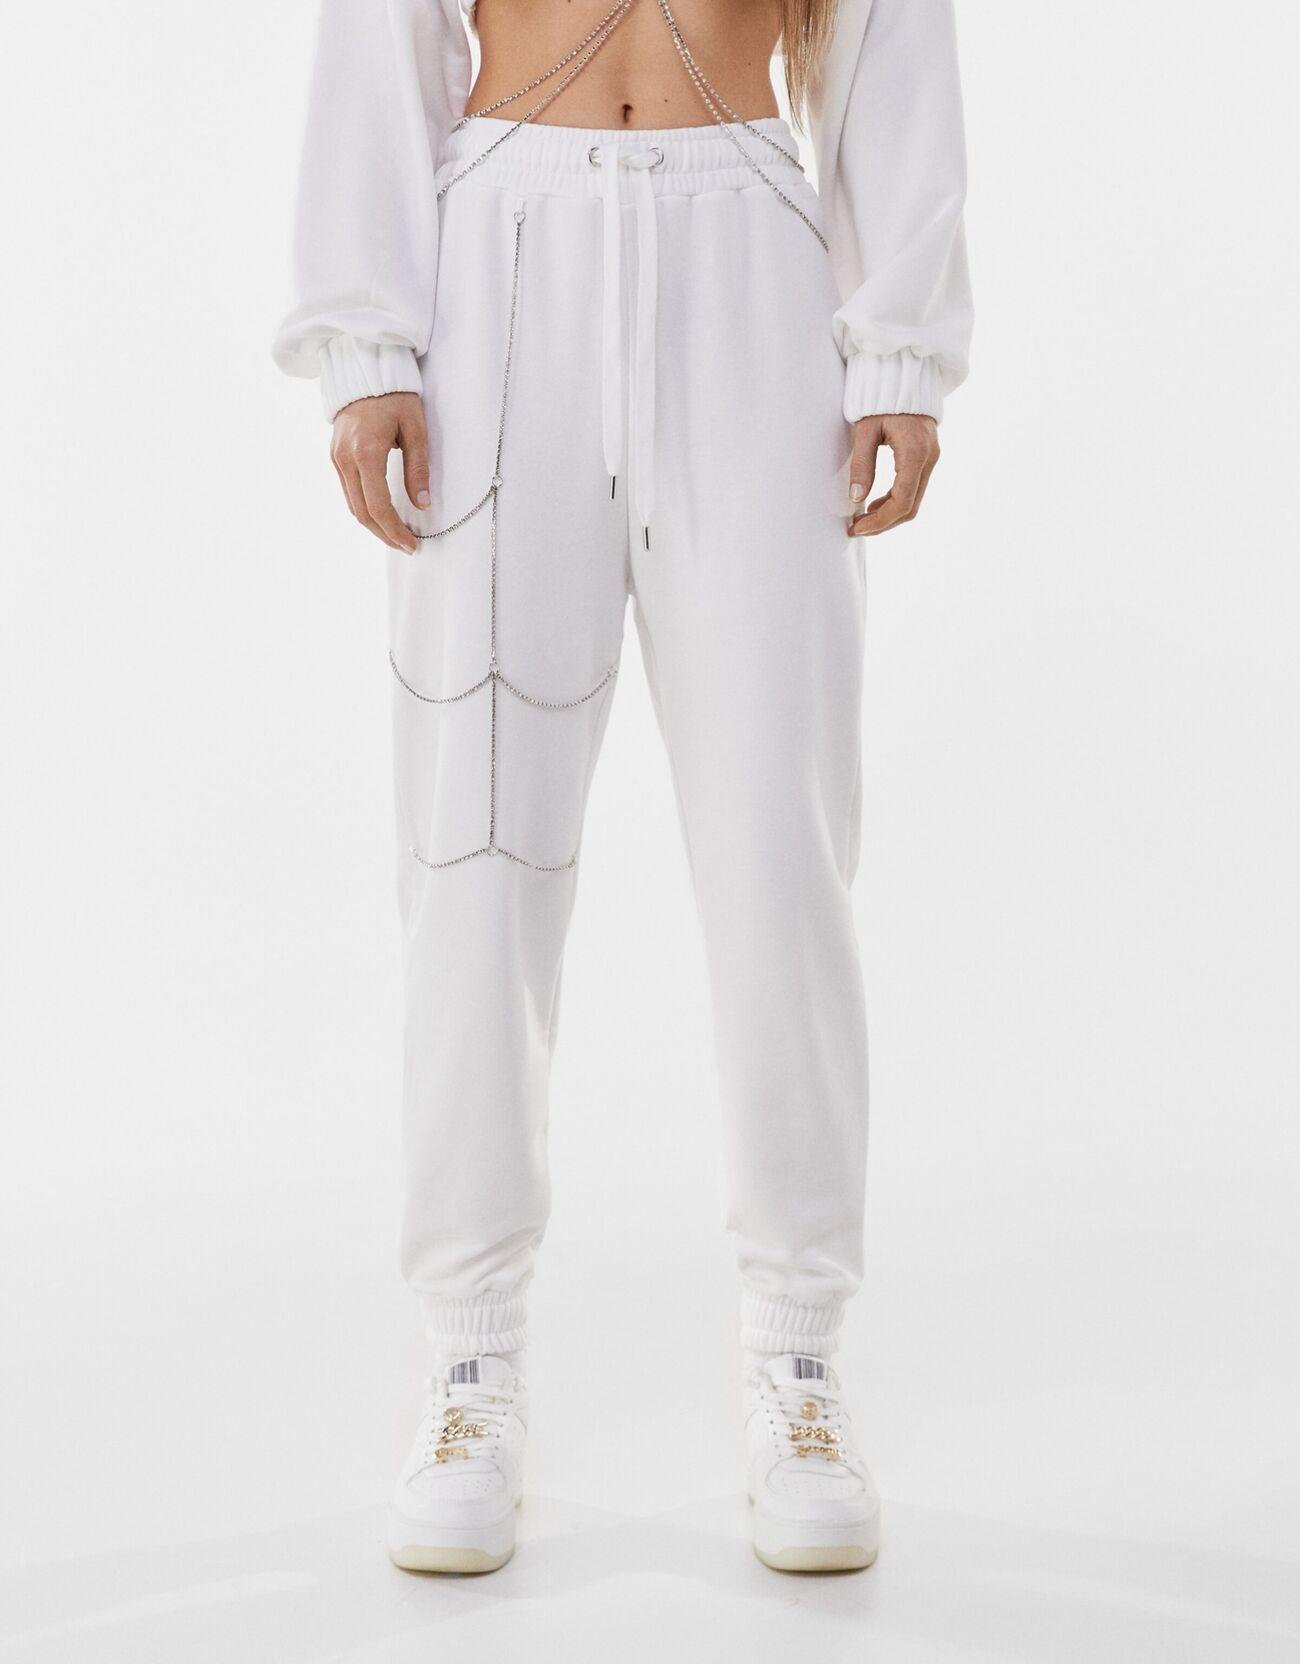 Bershka Pantalon Molleton Strass Paloma Mami X Bershka Femme Xs Blanc Cassé